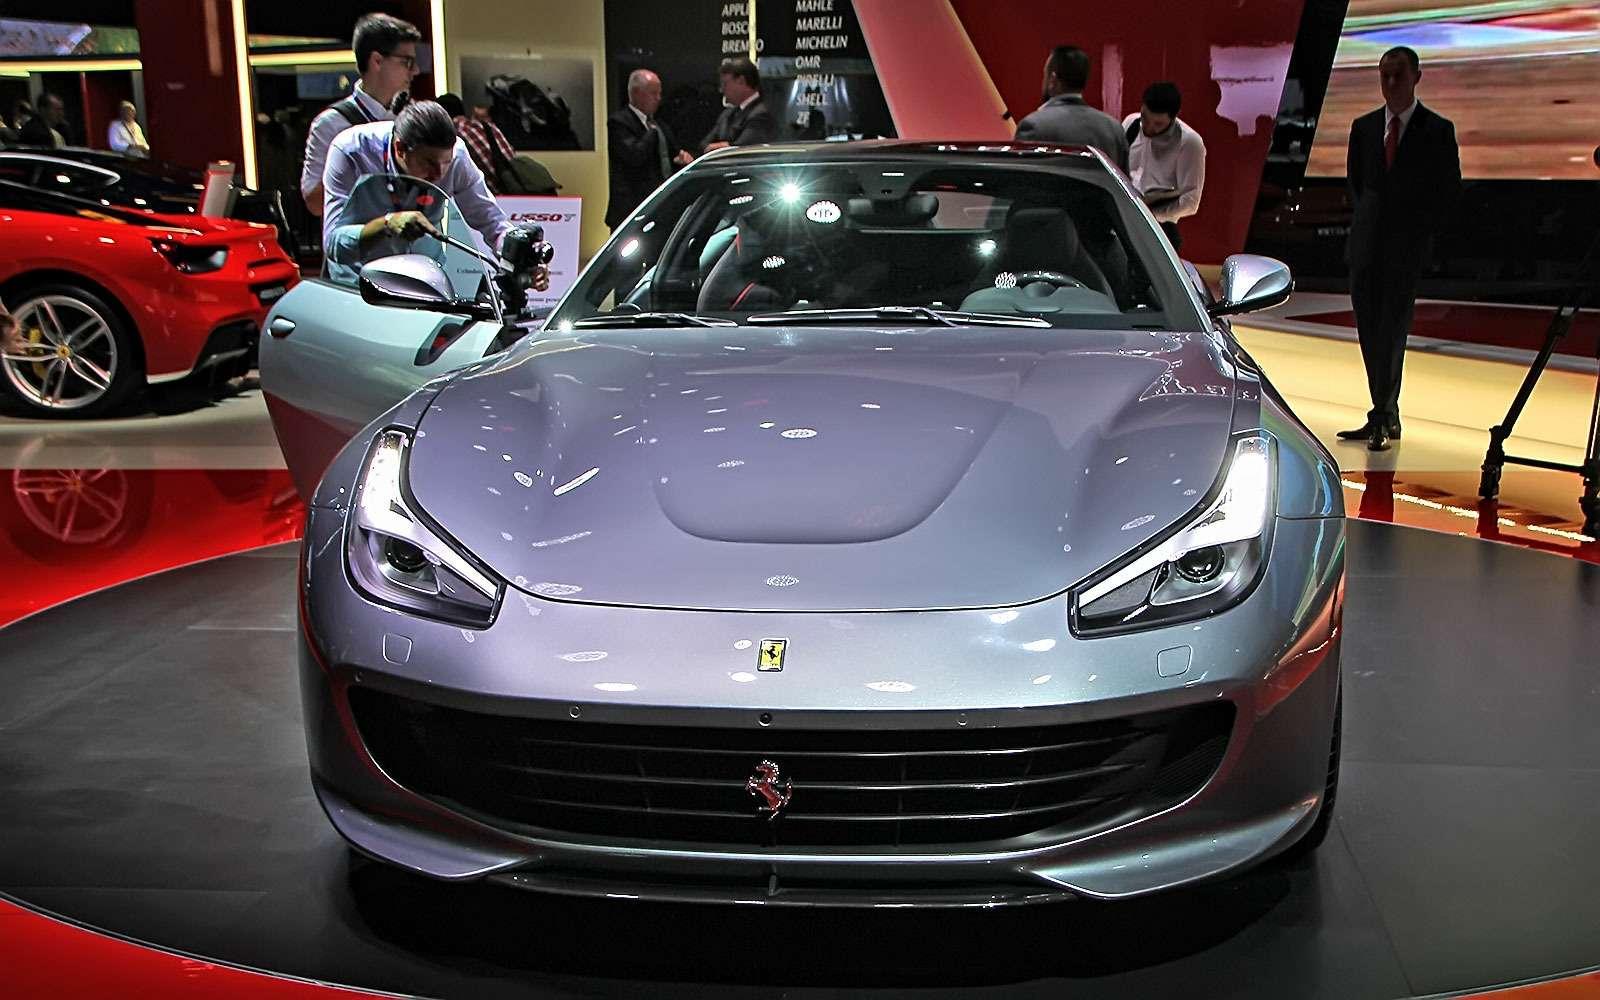 Махнул не глядя: Ferrari GTC4Lusso Tпоменял полный привод натурбонаддув— фото 641672